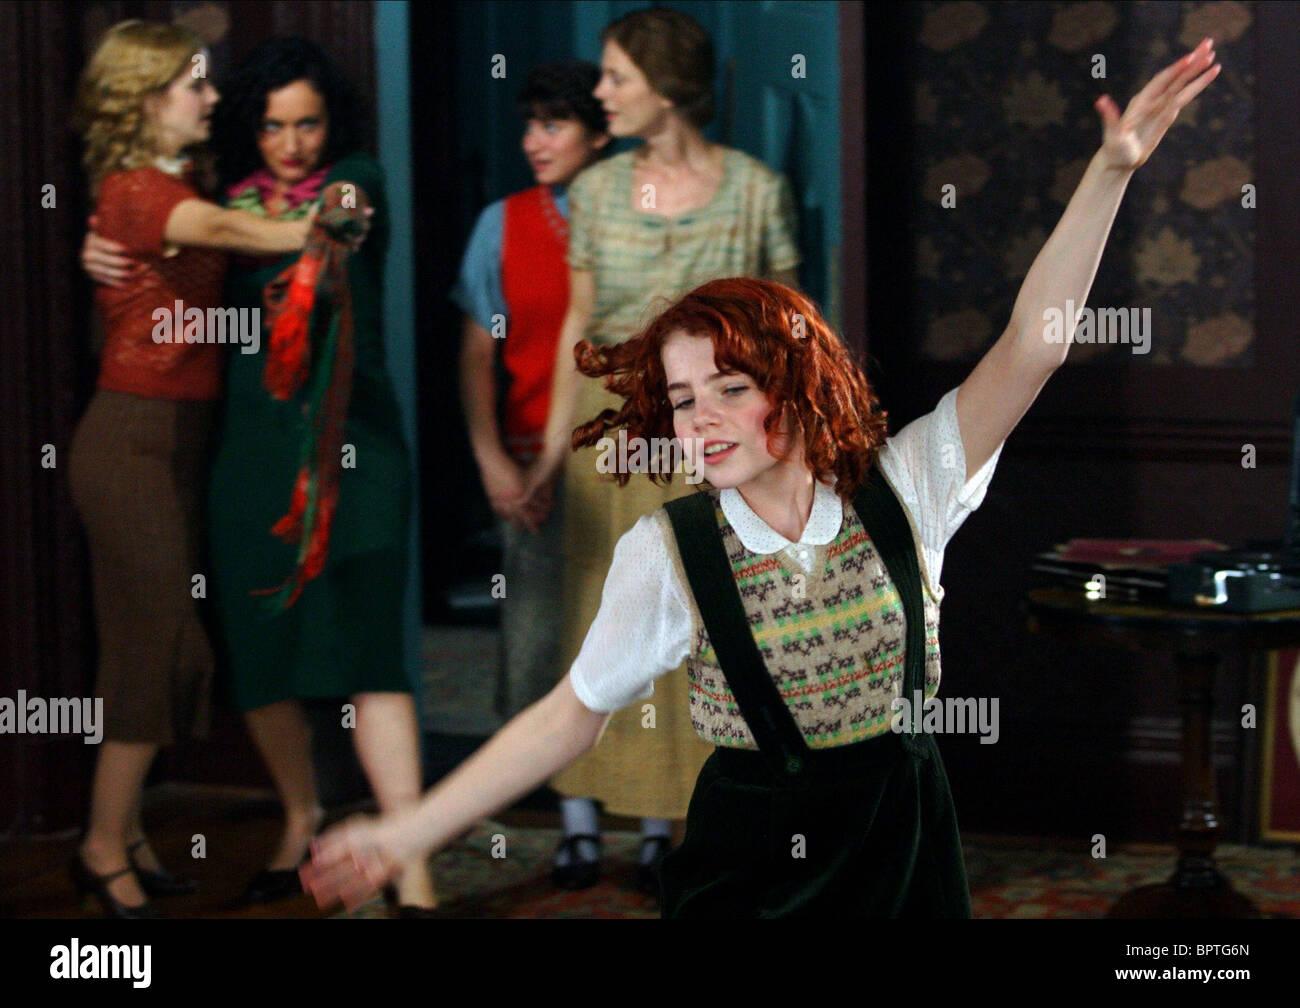 EMMA WATSON LUCY COHU YASMIN PAIGE Emilia Fox & Lucy Boynton, zapatos de ballet (2007). Imagen De Stock